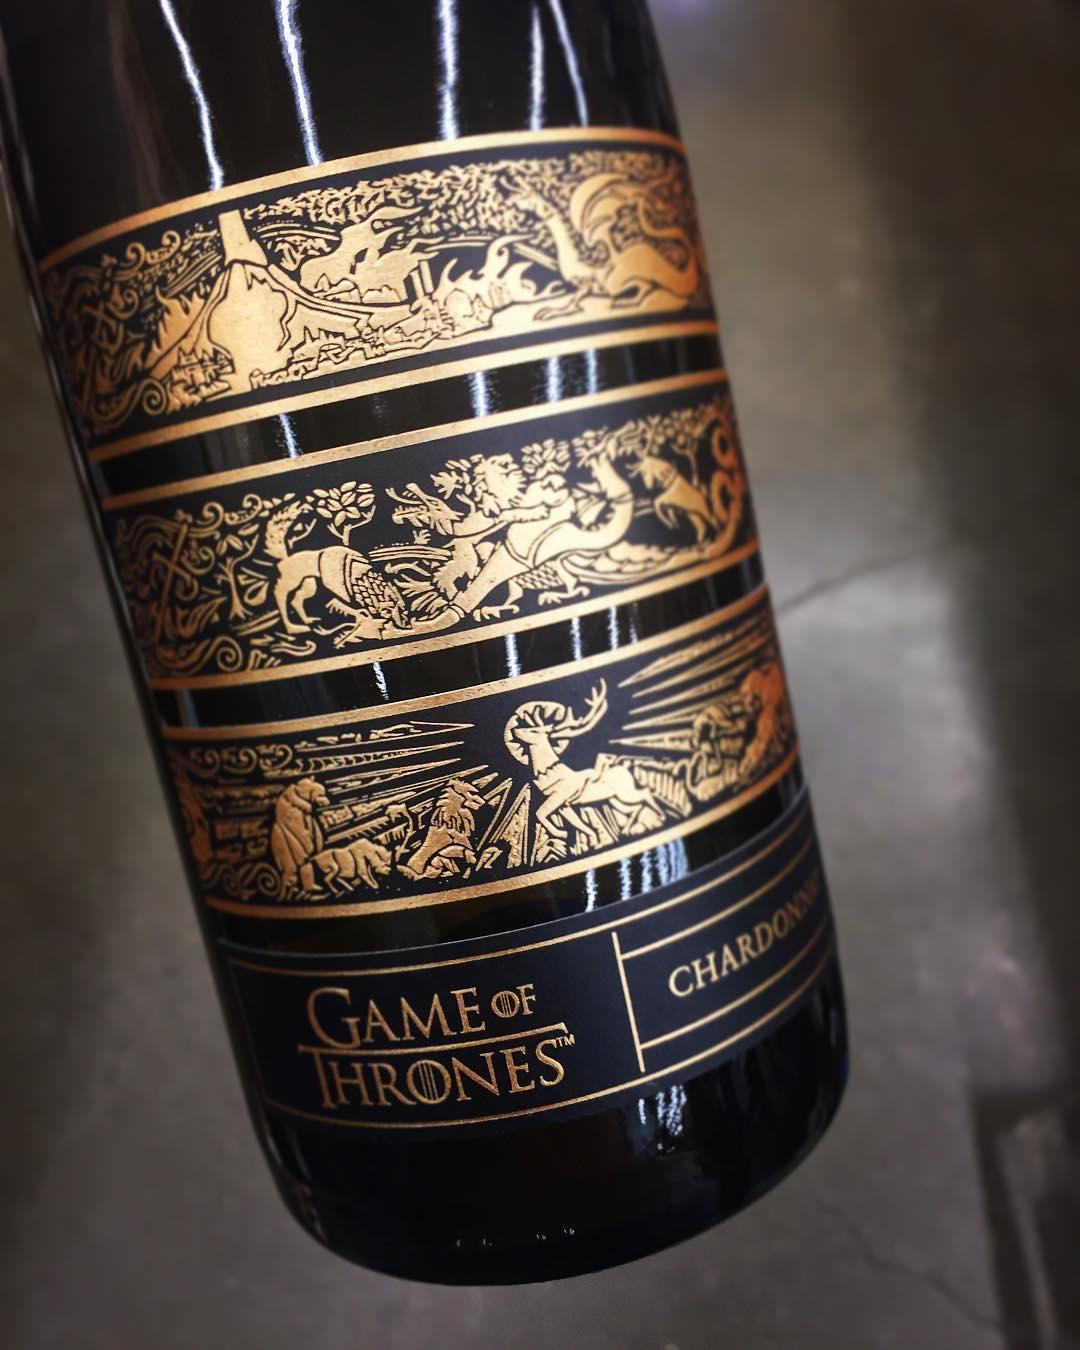 Game of Thrones wine!      gameofthroneshellip